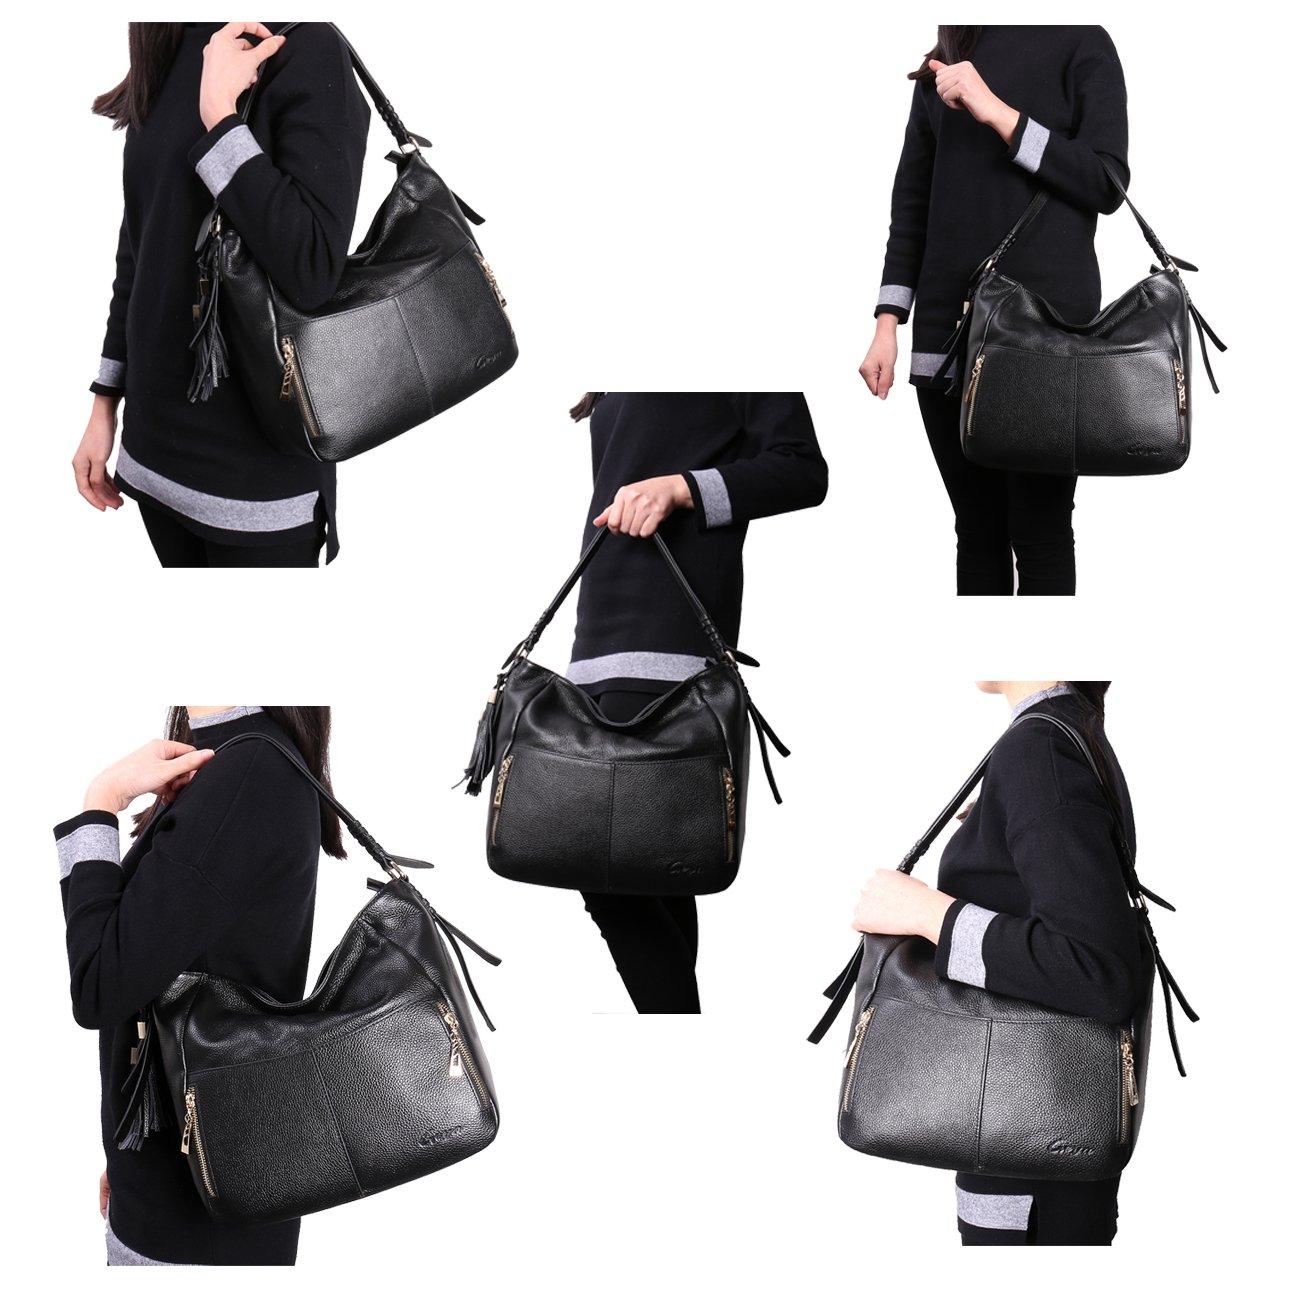 Geya Women's Fashion Genuine Leather Handbag Shoulder Handbag with Imported Soft Hot Leather (Black) by Geya (Image #5)